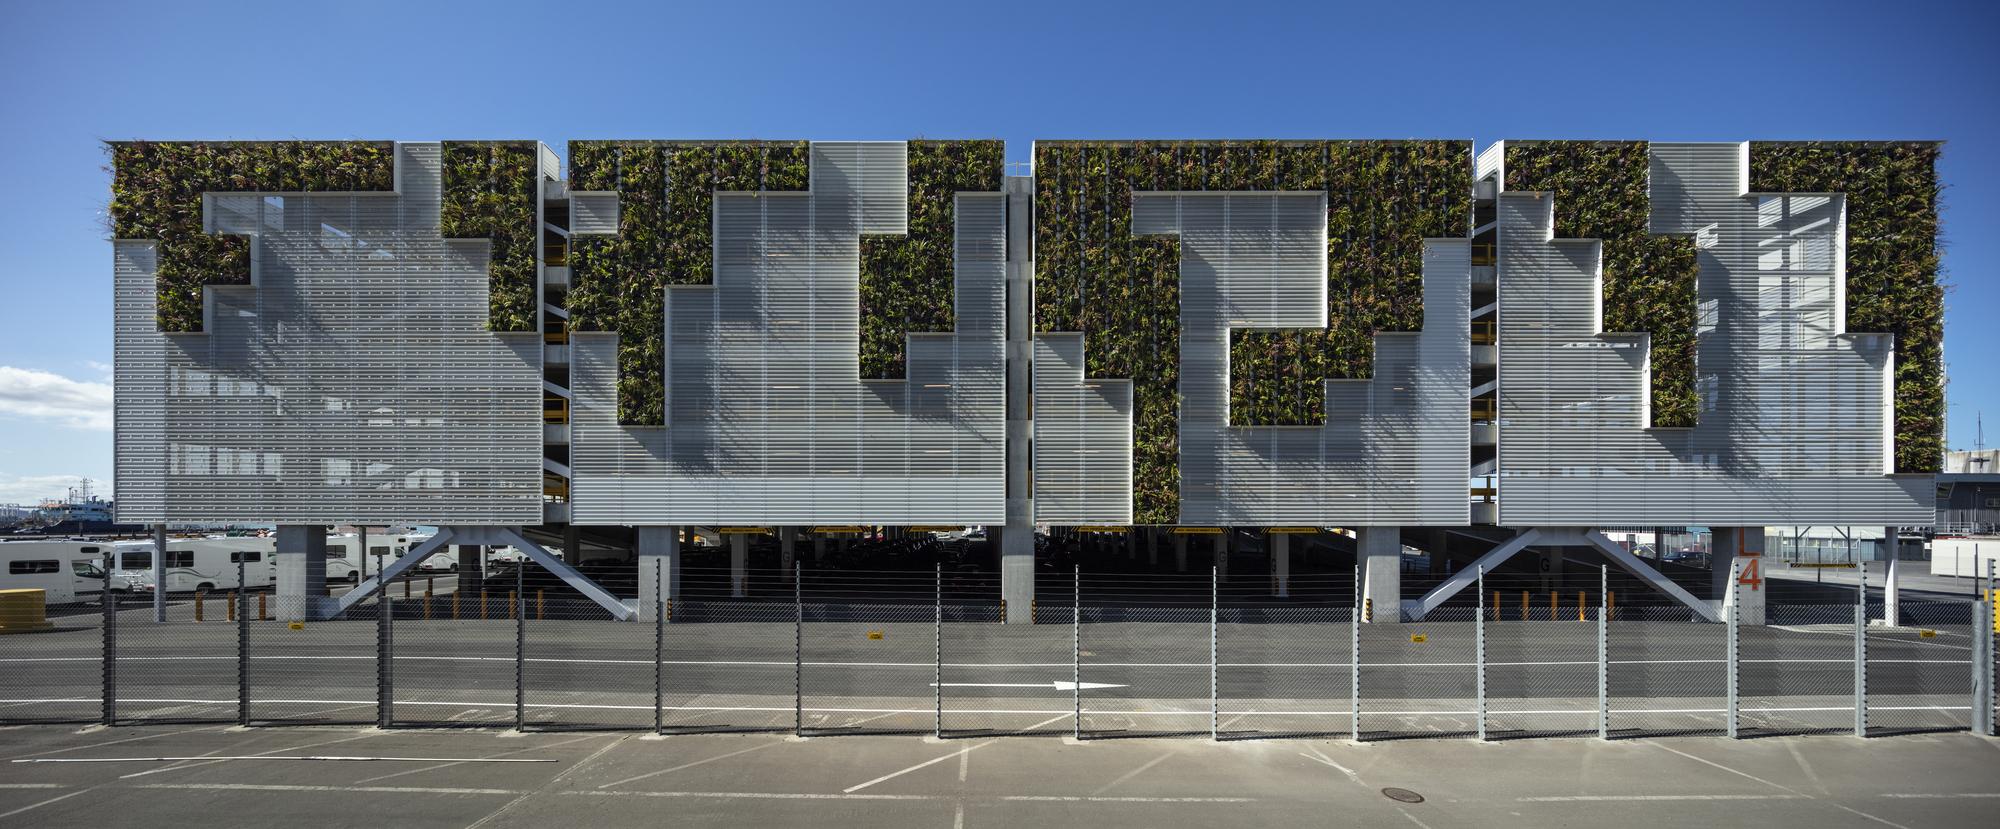 POAL Car Handling Facility / Plus Architecture